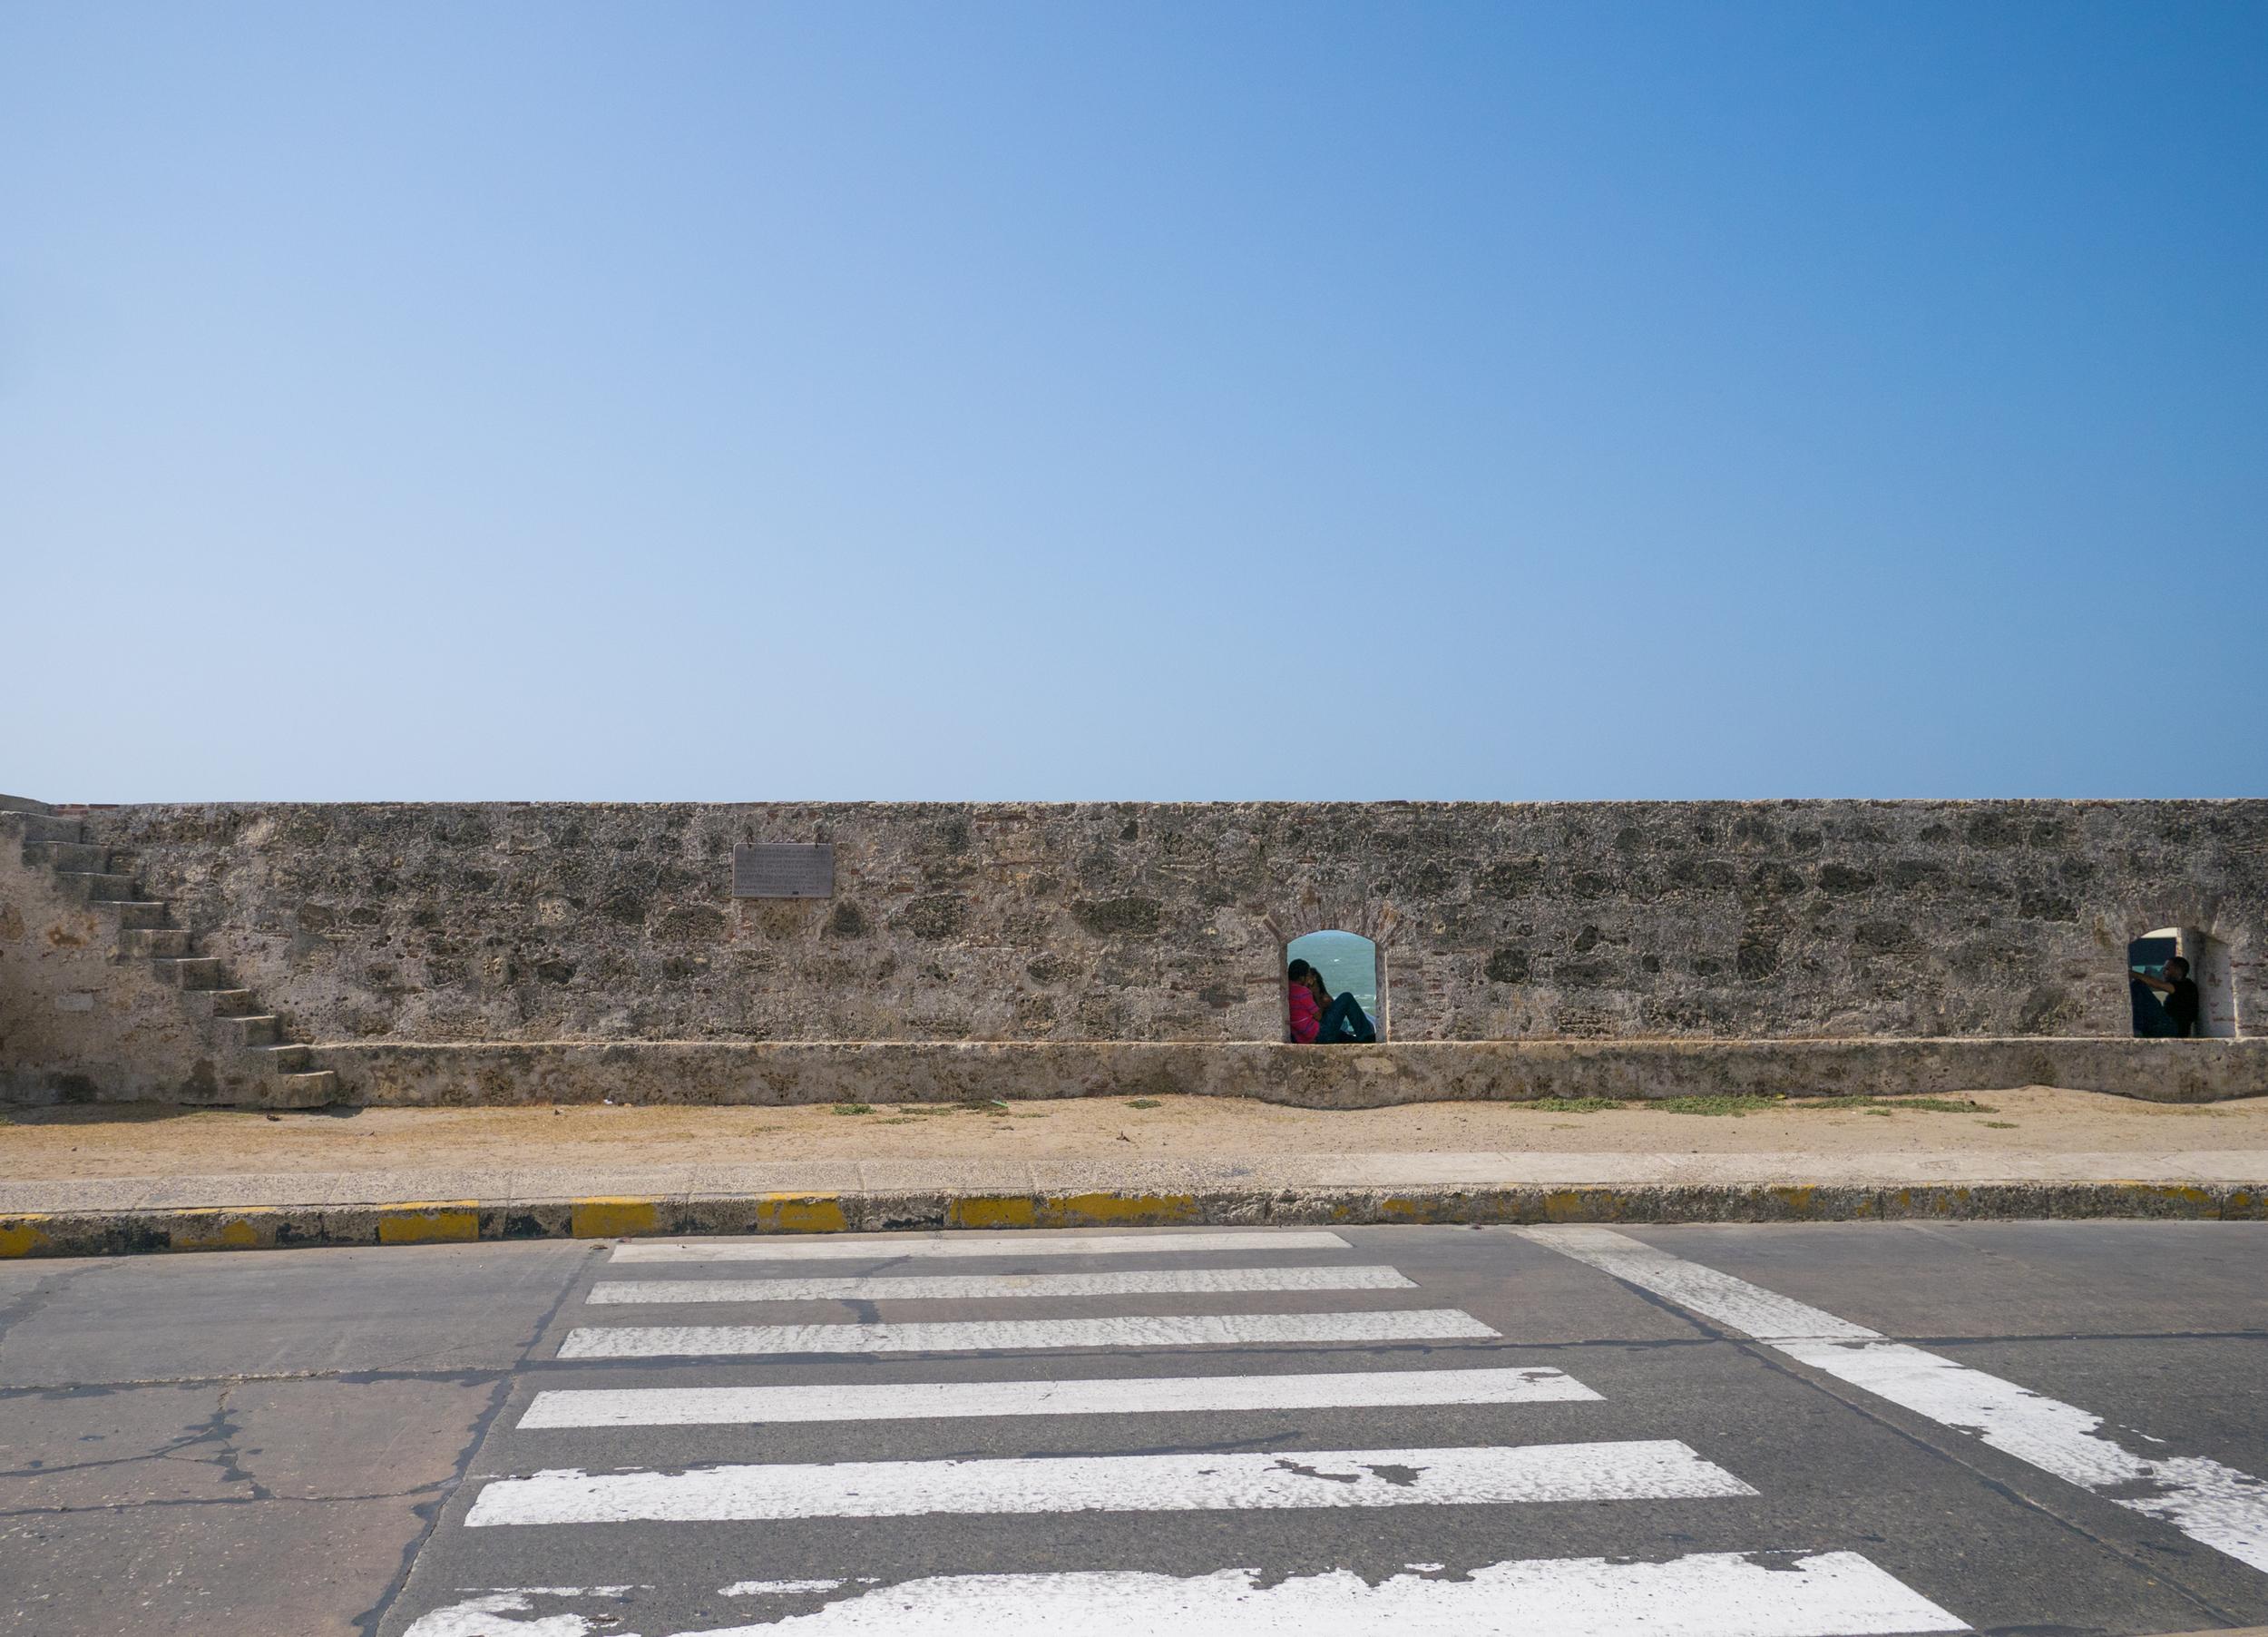 Cartagena the City of Love